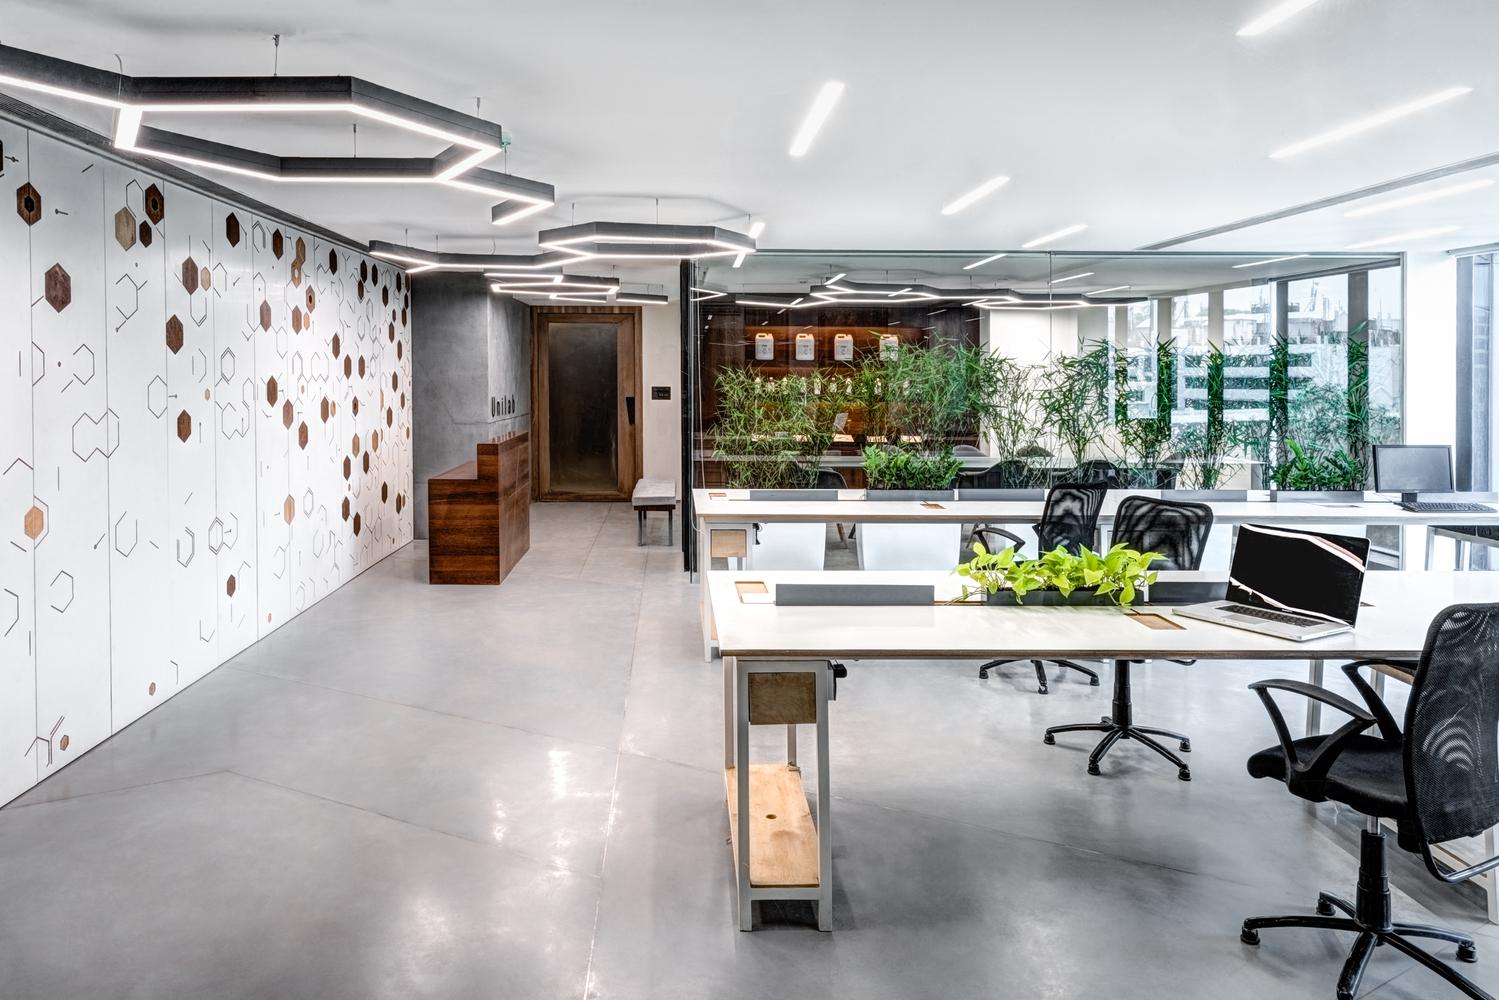 Unilab Pharma Office / SAV Architecture + Design